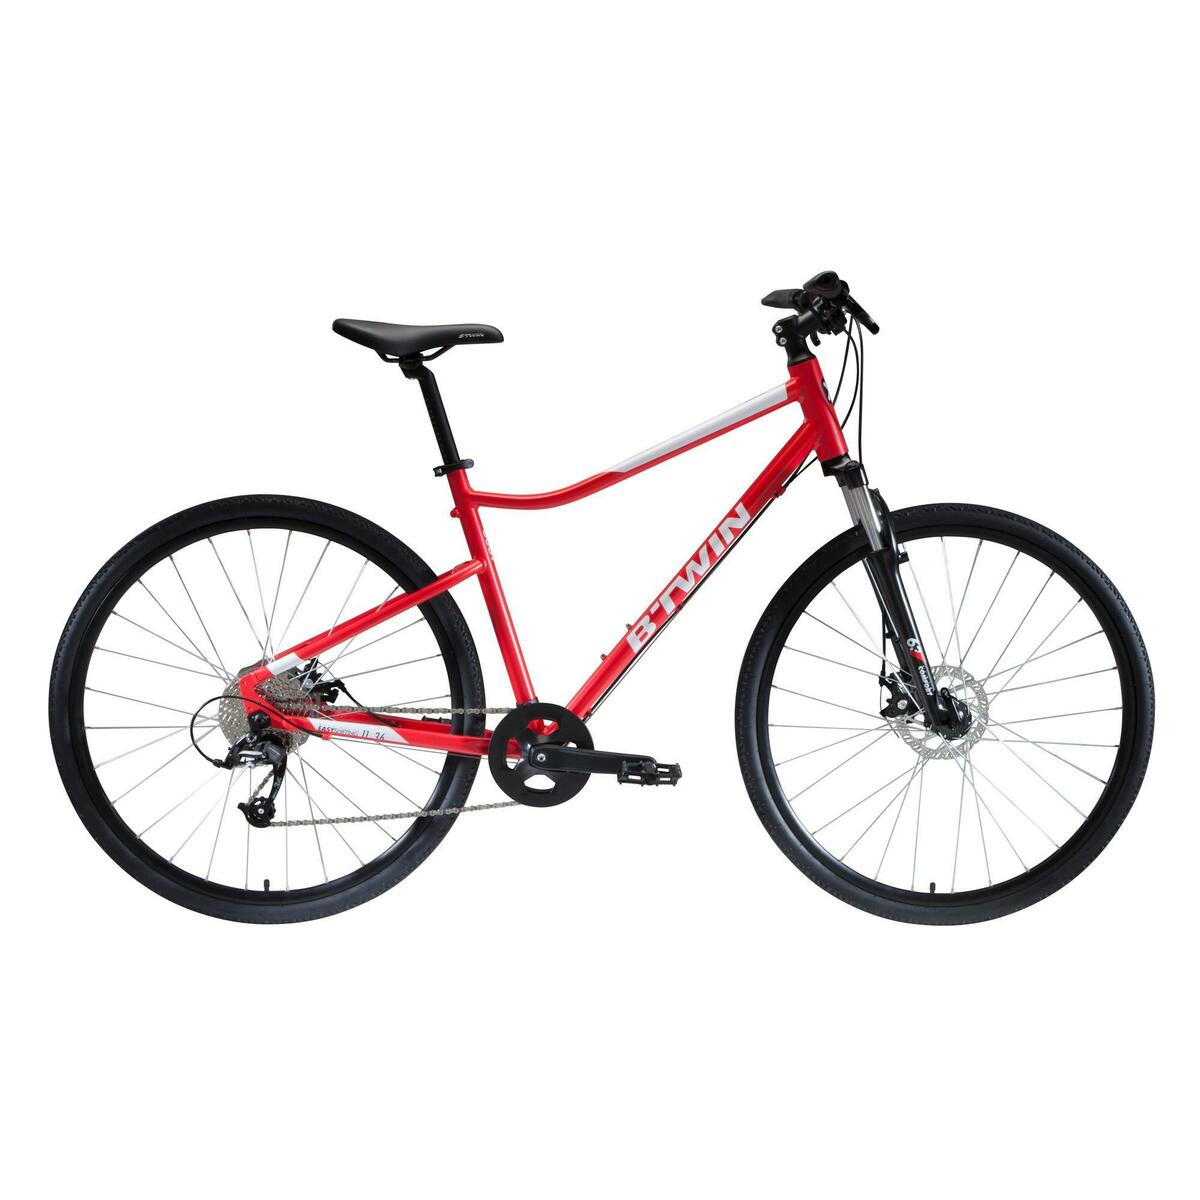 Bild 1 von Cross Bike 28 Riverside 500 Alu rot